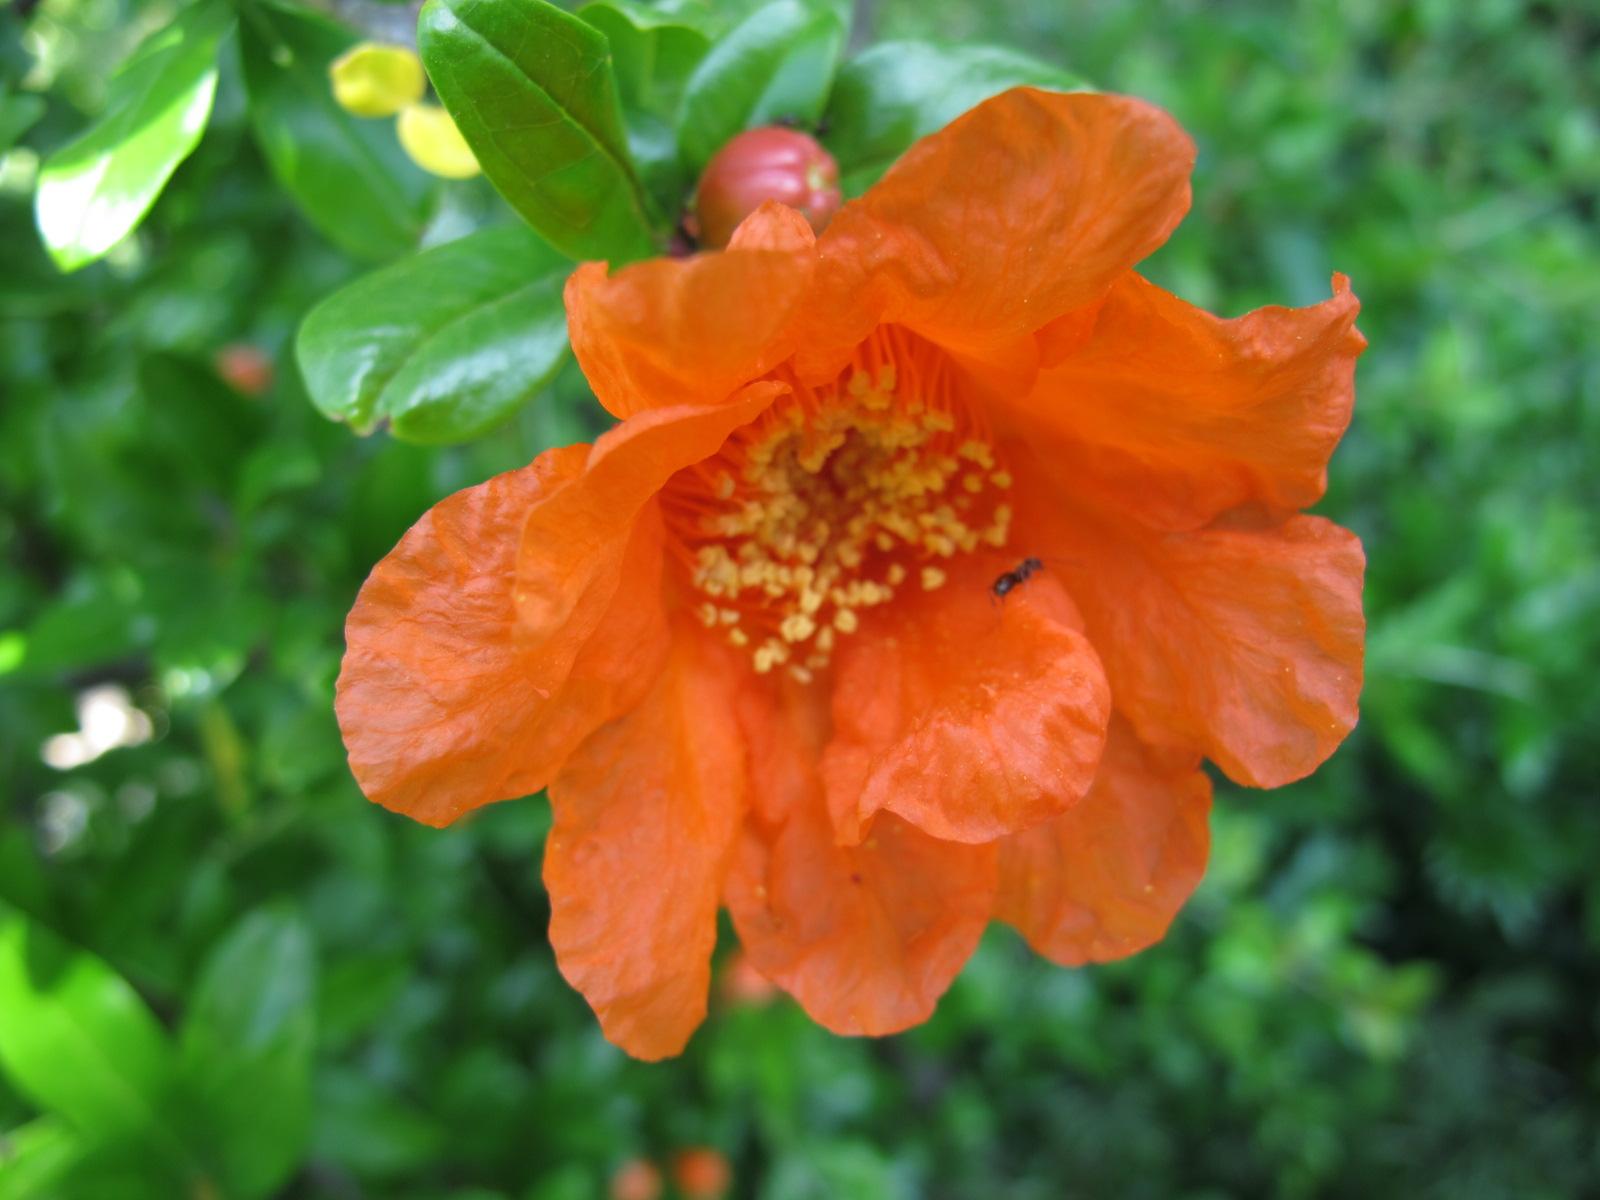 The pomegranate flowers burst open